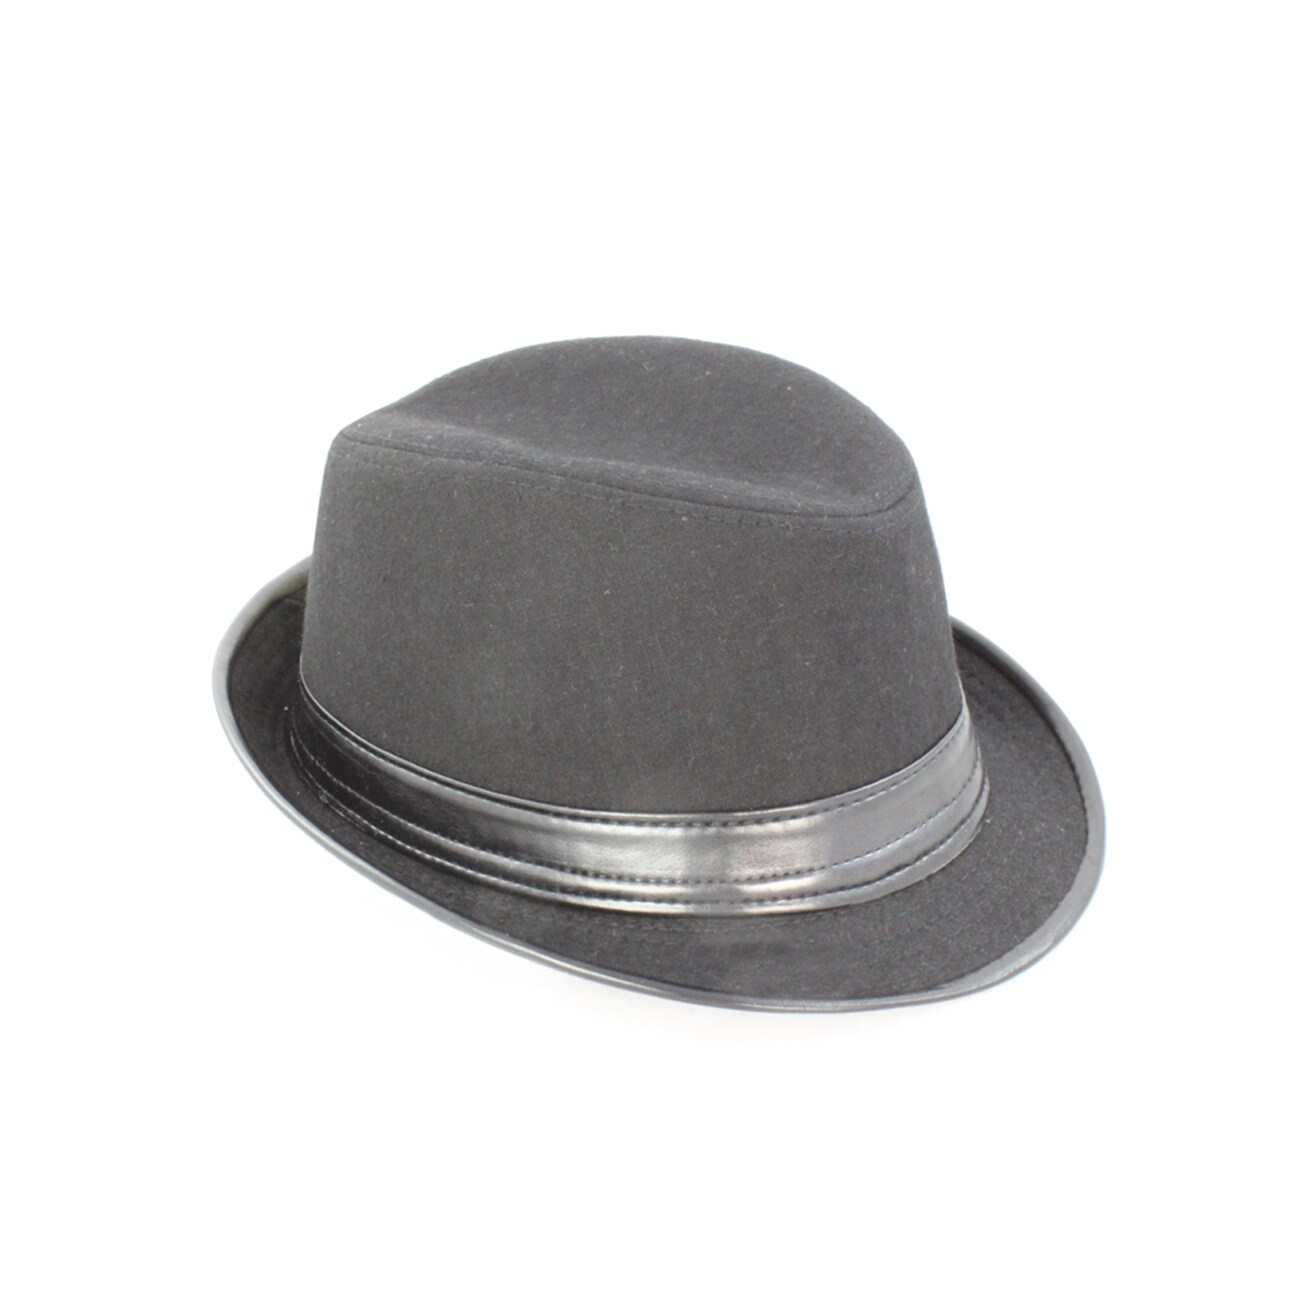 Faddism Men's Black Fedora Hat